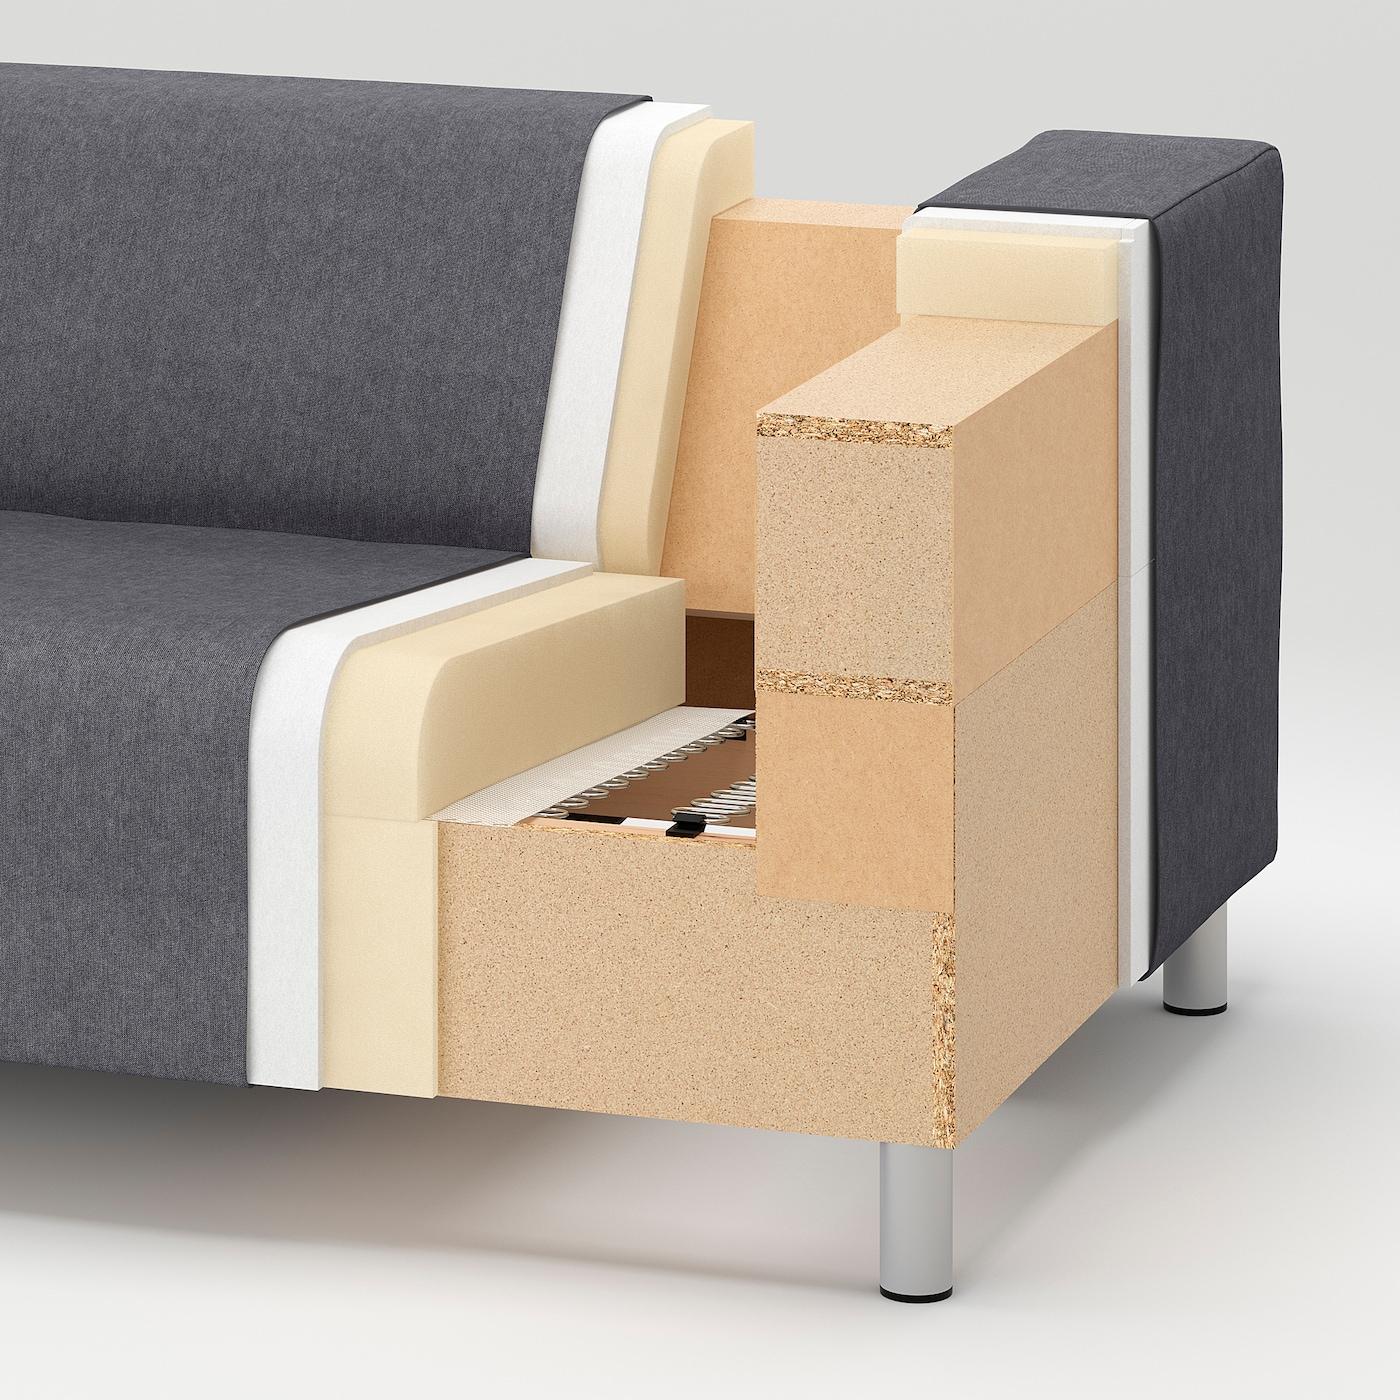 Leren Klippan Bank Ikea.Klippan 2 Zitsbank Bomstad Zwart Ikea